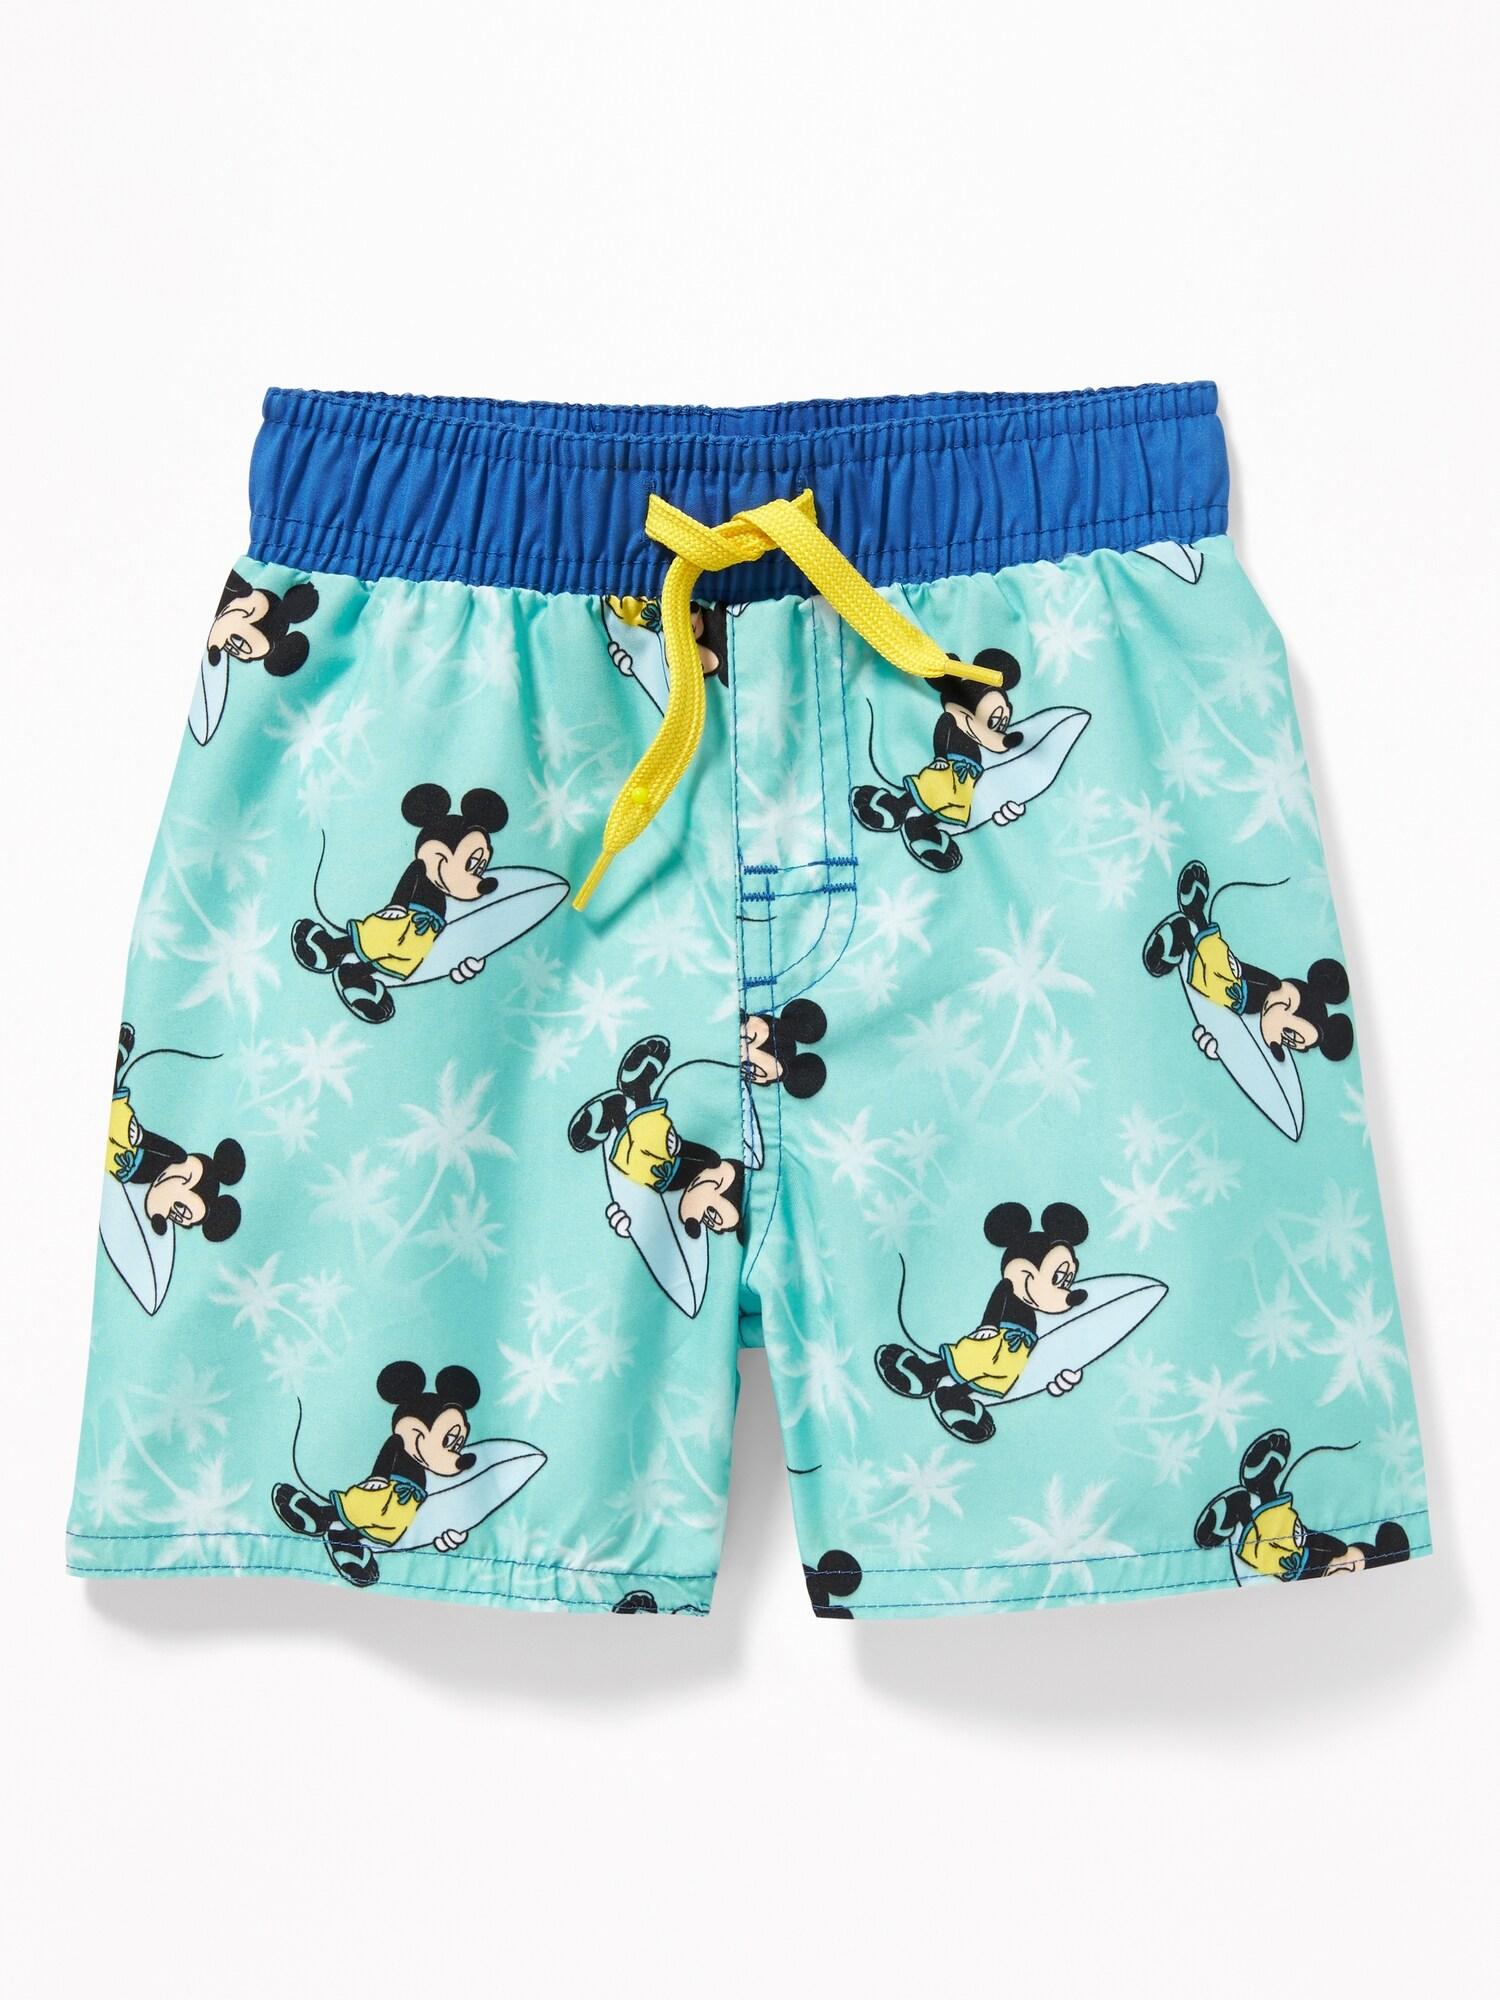 f0d13b27d9f61 Disney© Mickey Mouse Swim Trunks for Toddler Boys | Old Navy